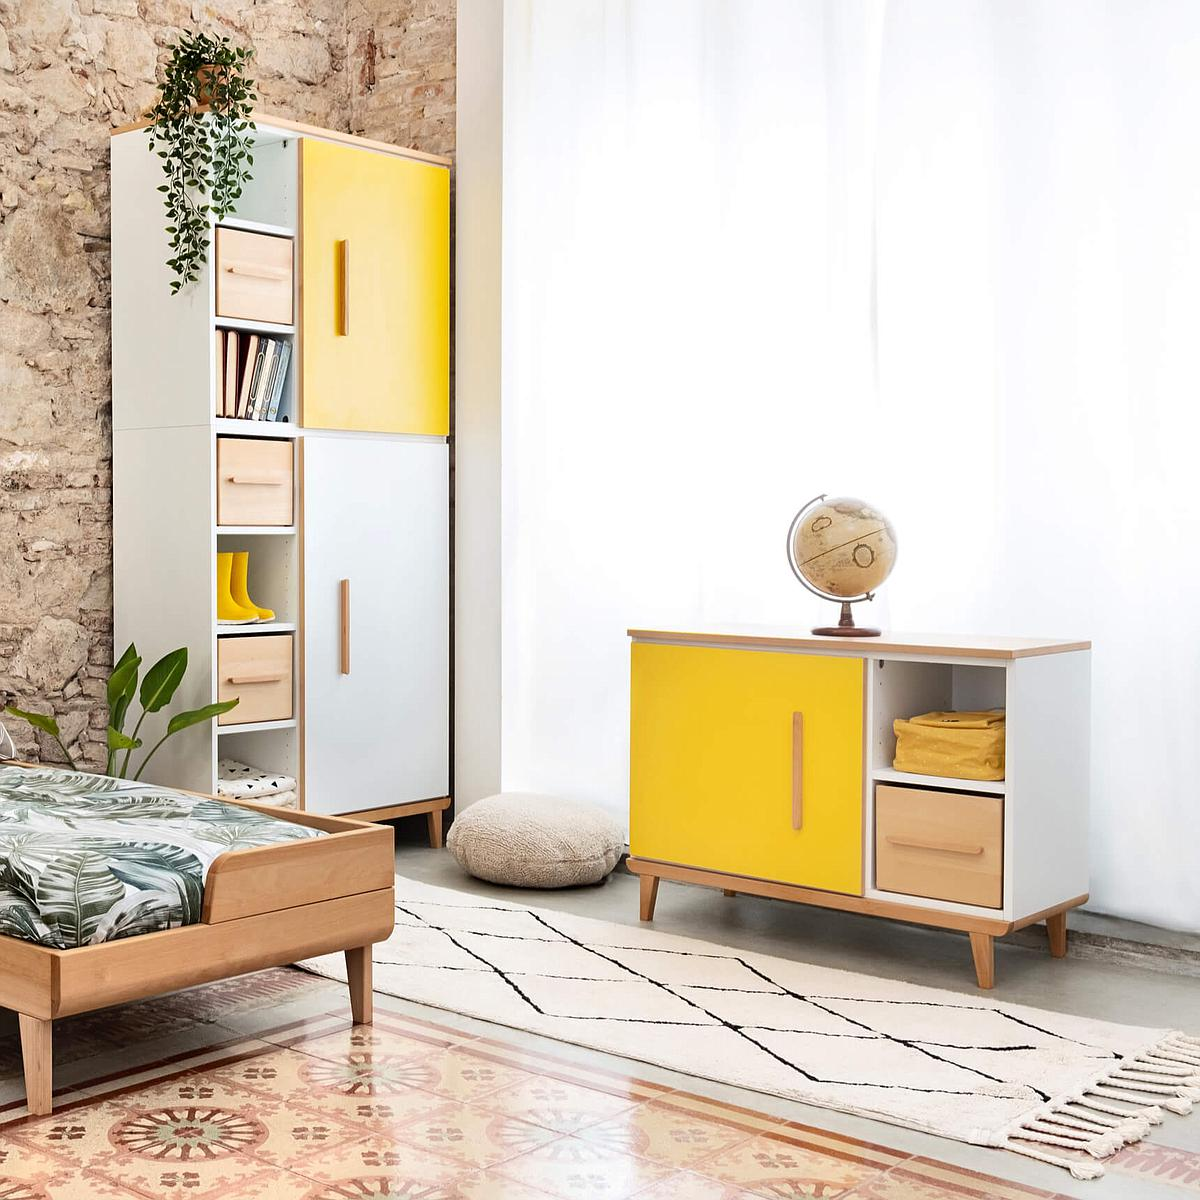 Kleinmöbel 1-türig NADO sunshine yellow